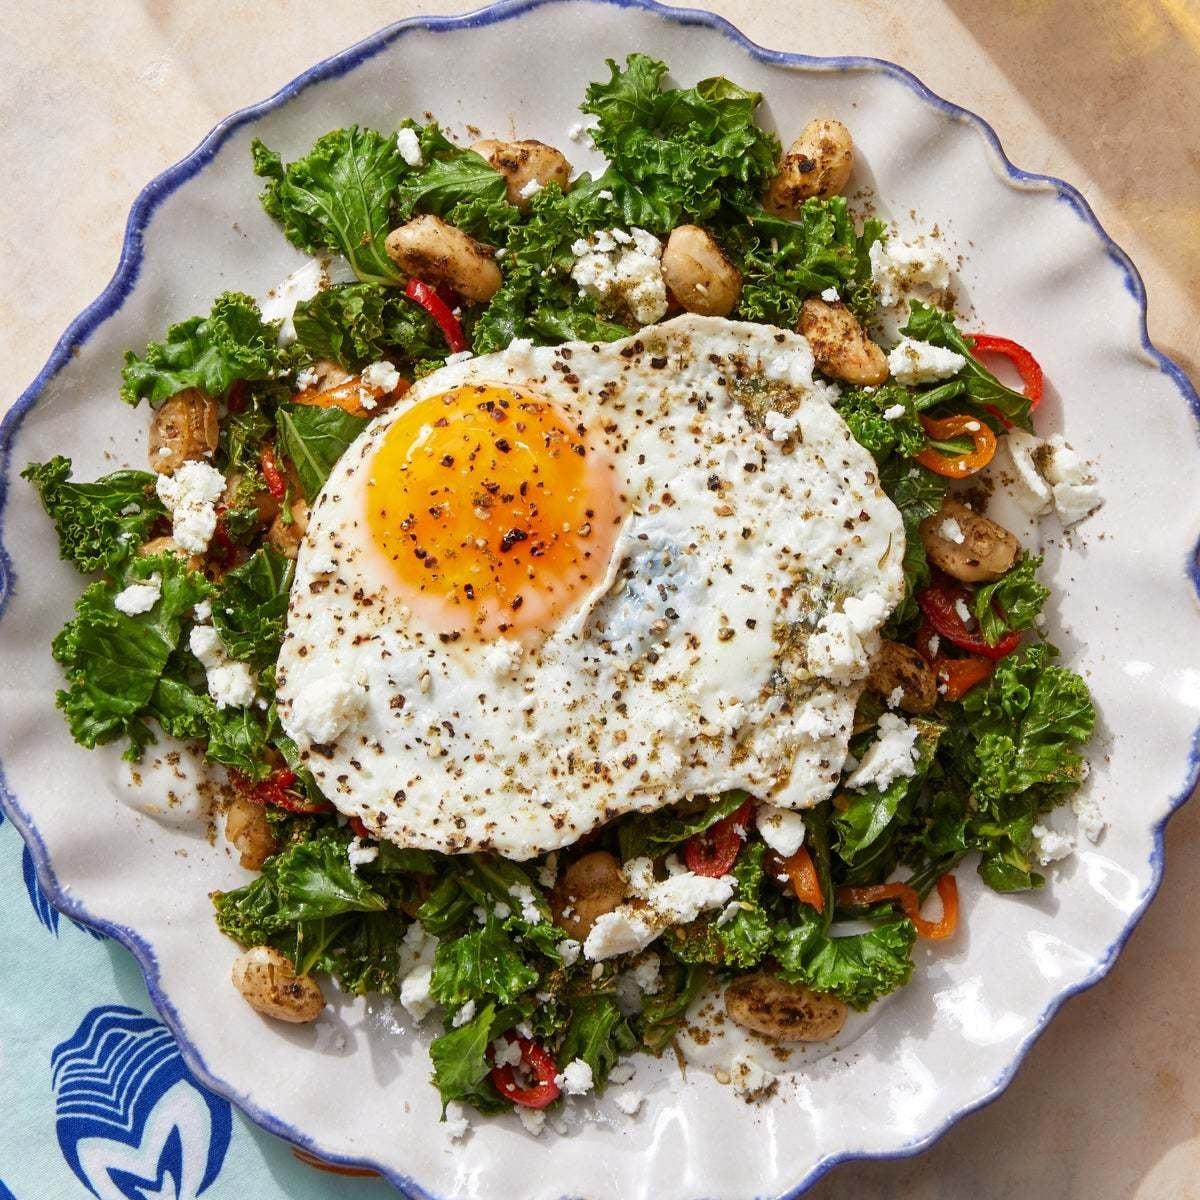 Mediterranean White Bean & Kale Sauté with Fried Eggs & Preserved Lemon Yogurt